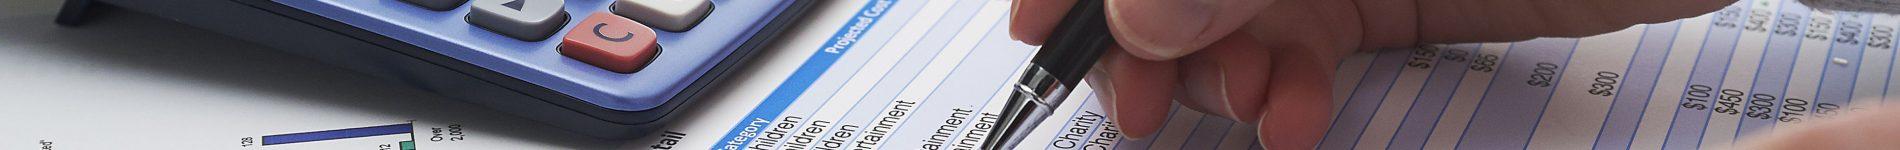 Financial-Ratio-Categories-56a091f03df78cafdaa2d0d5